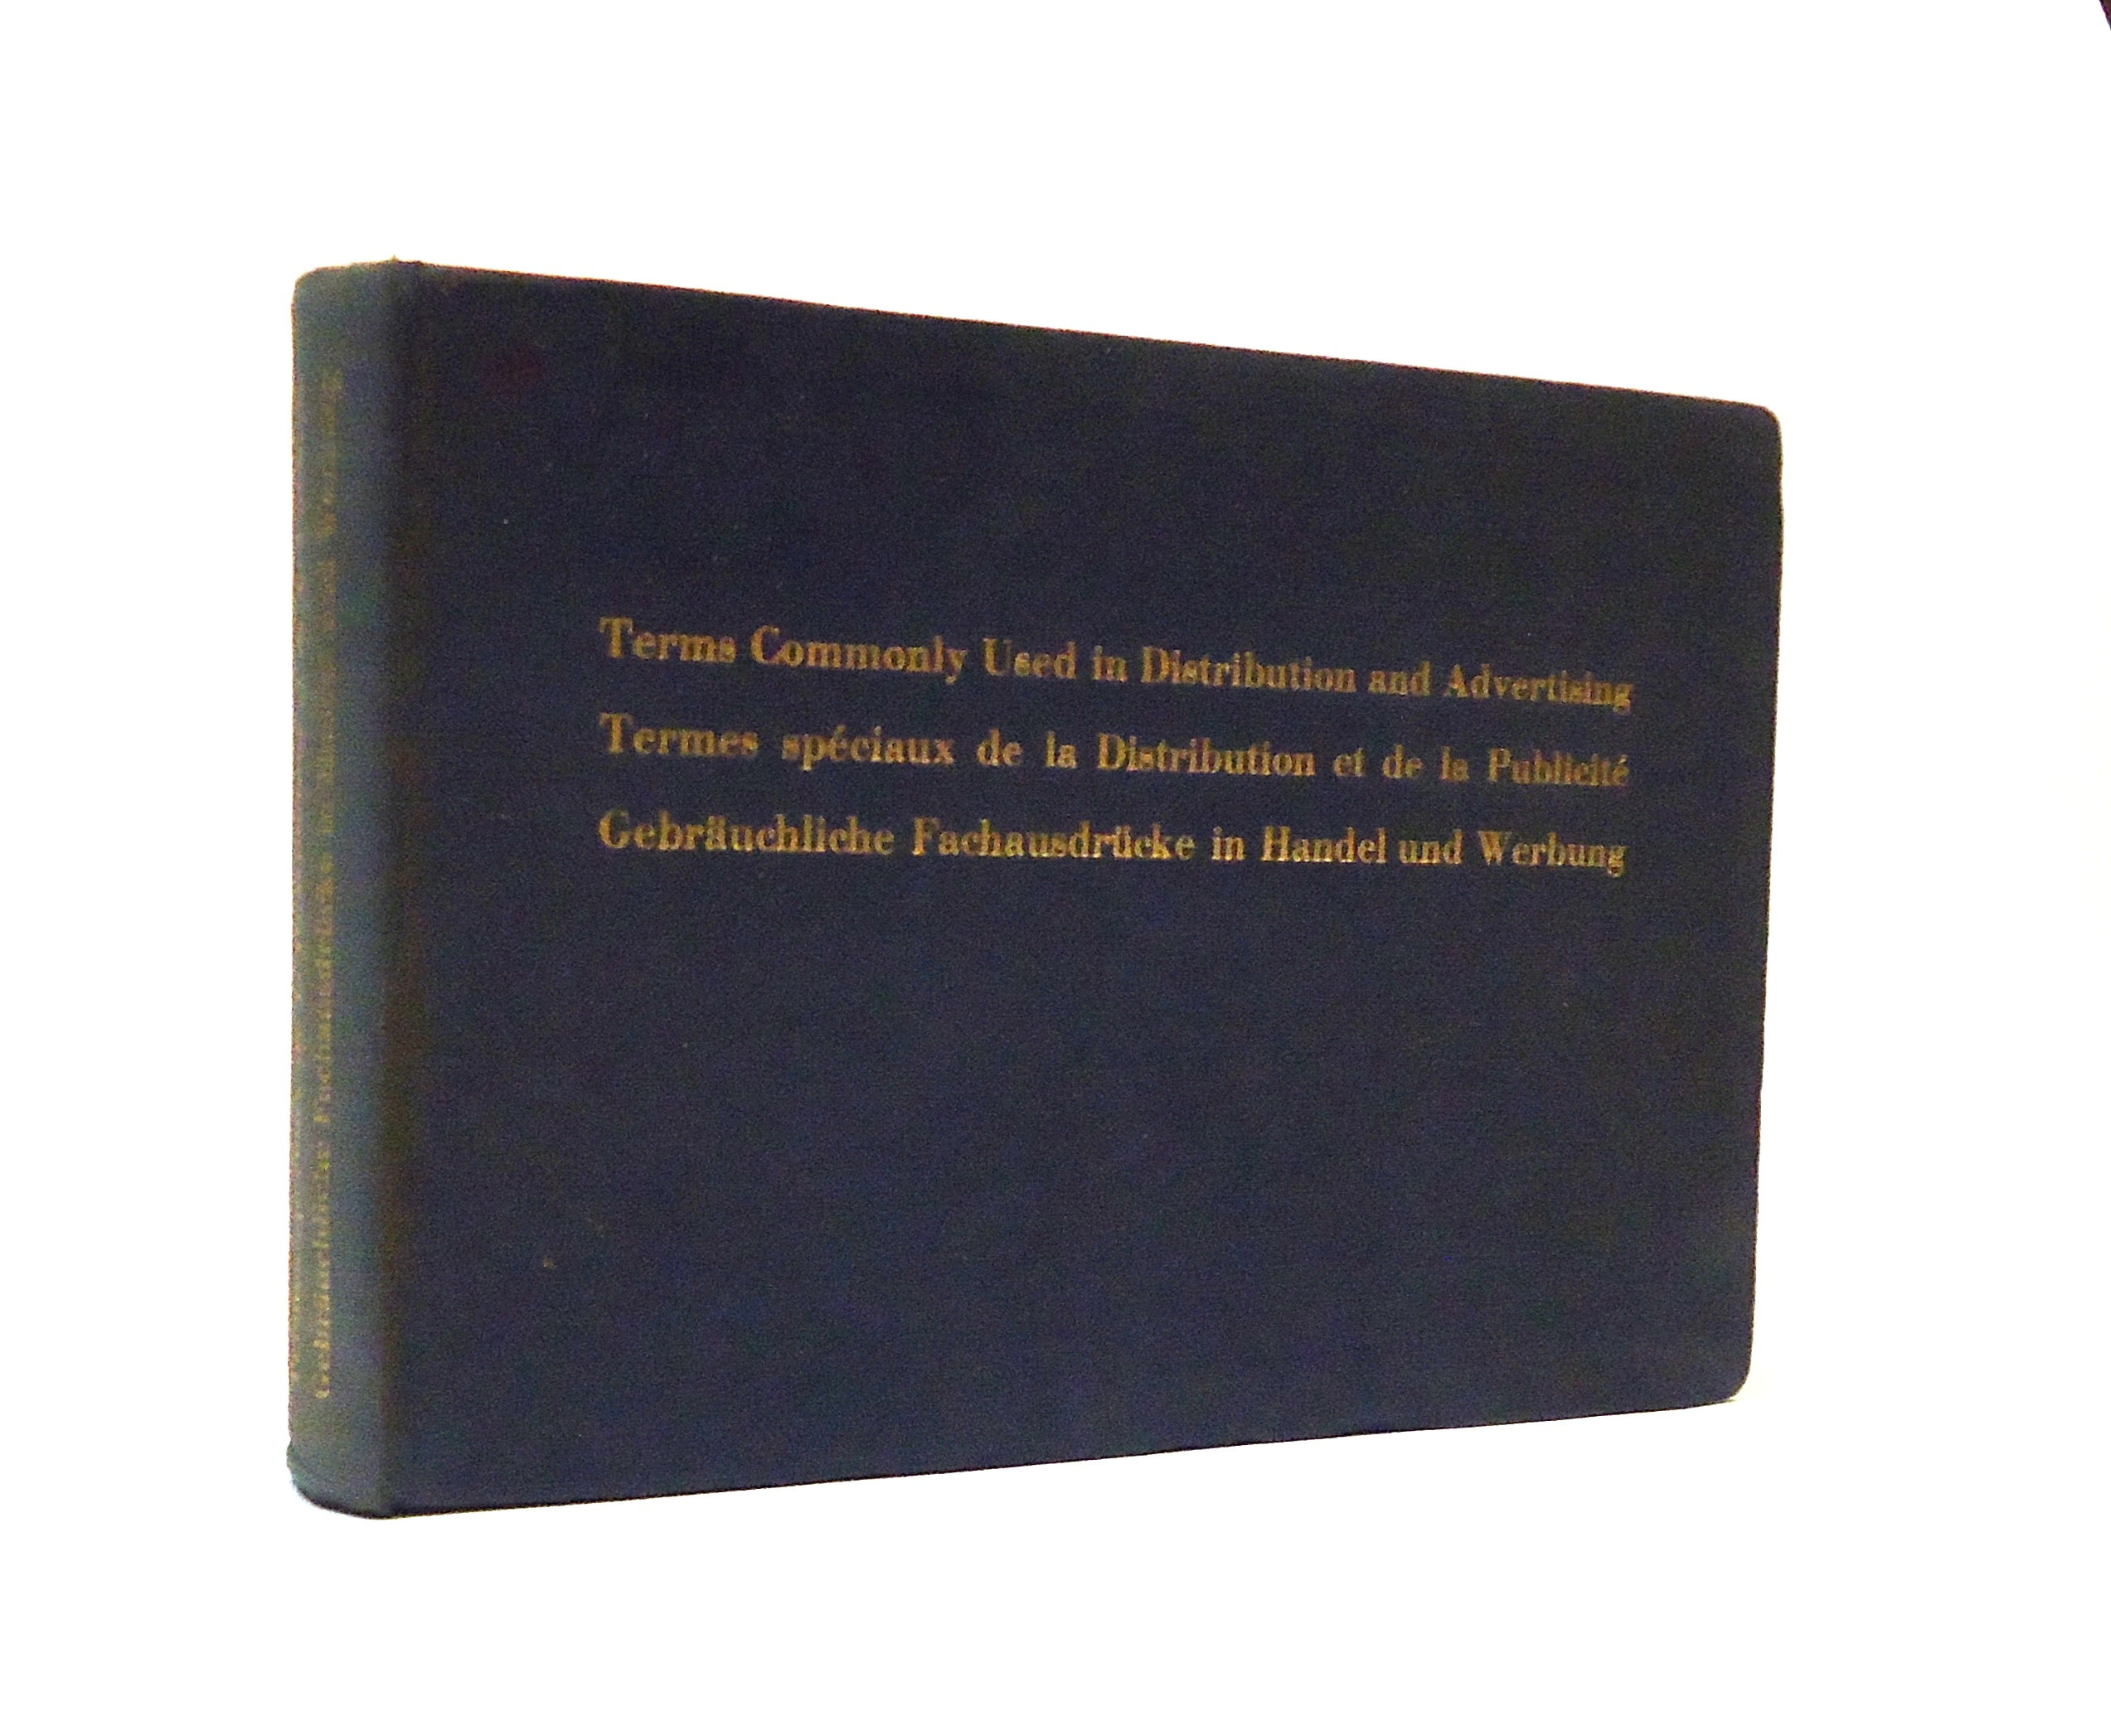 Terms Commonly Used in Distribution and Advertising / Termes speciaux de la Distribution et de la Publicite / Gebräuchliche Fachausdrücke in Handel und Werbung.